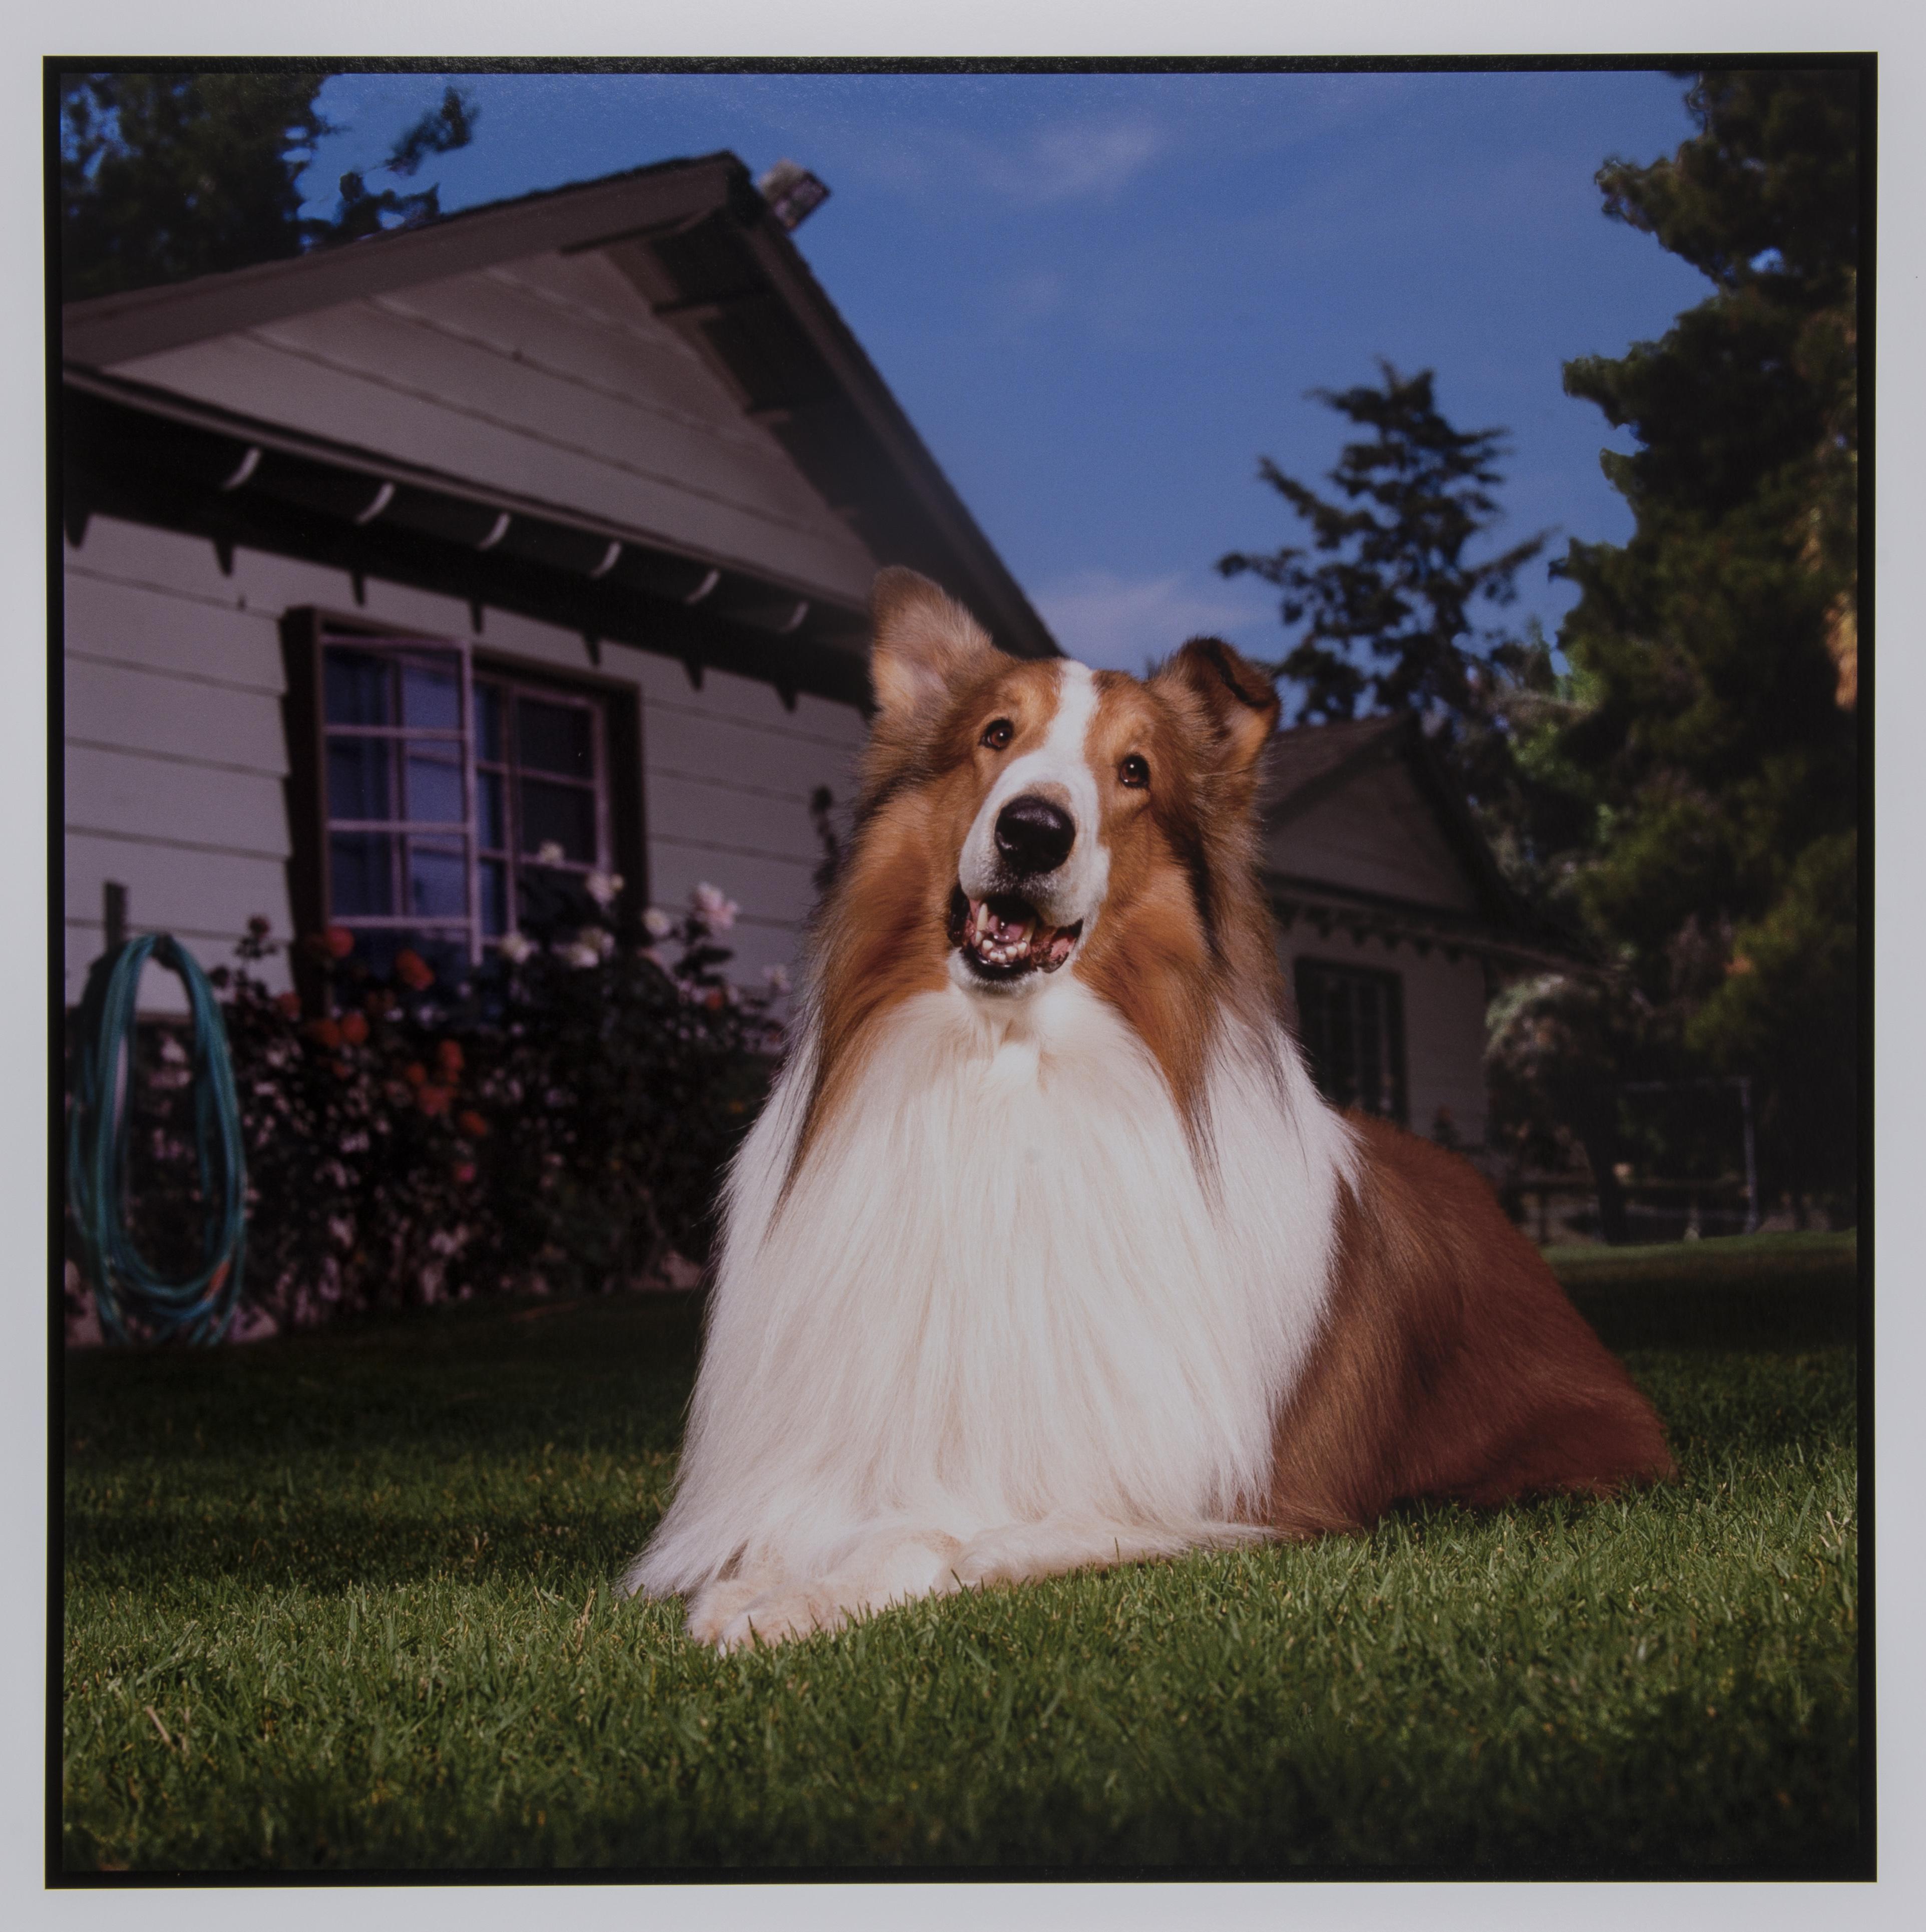 Bonnie Schiffman Lassie, 1988 Edition: artist's proof #2 Printed 2016 Archival inkjet print 20 x 20 inches